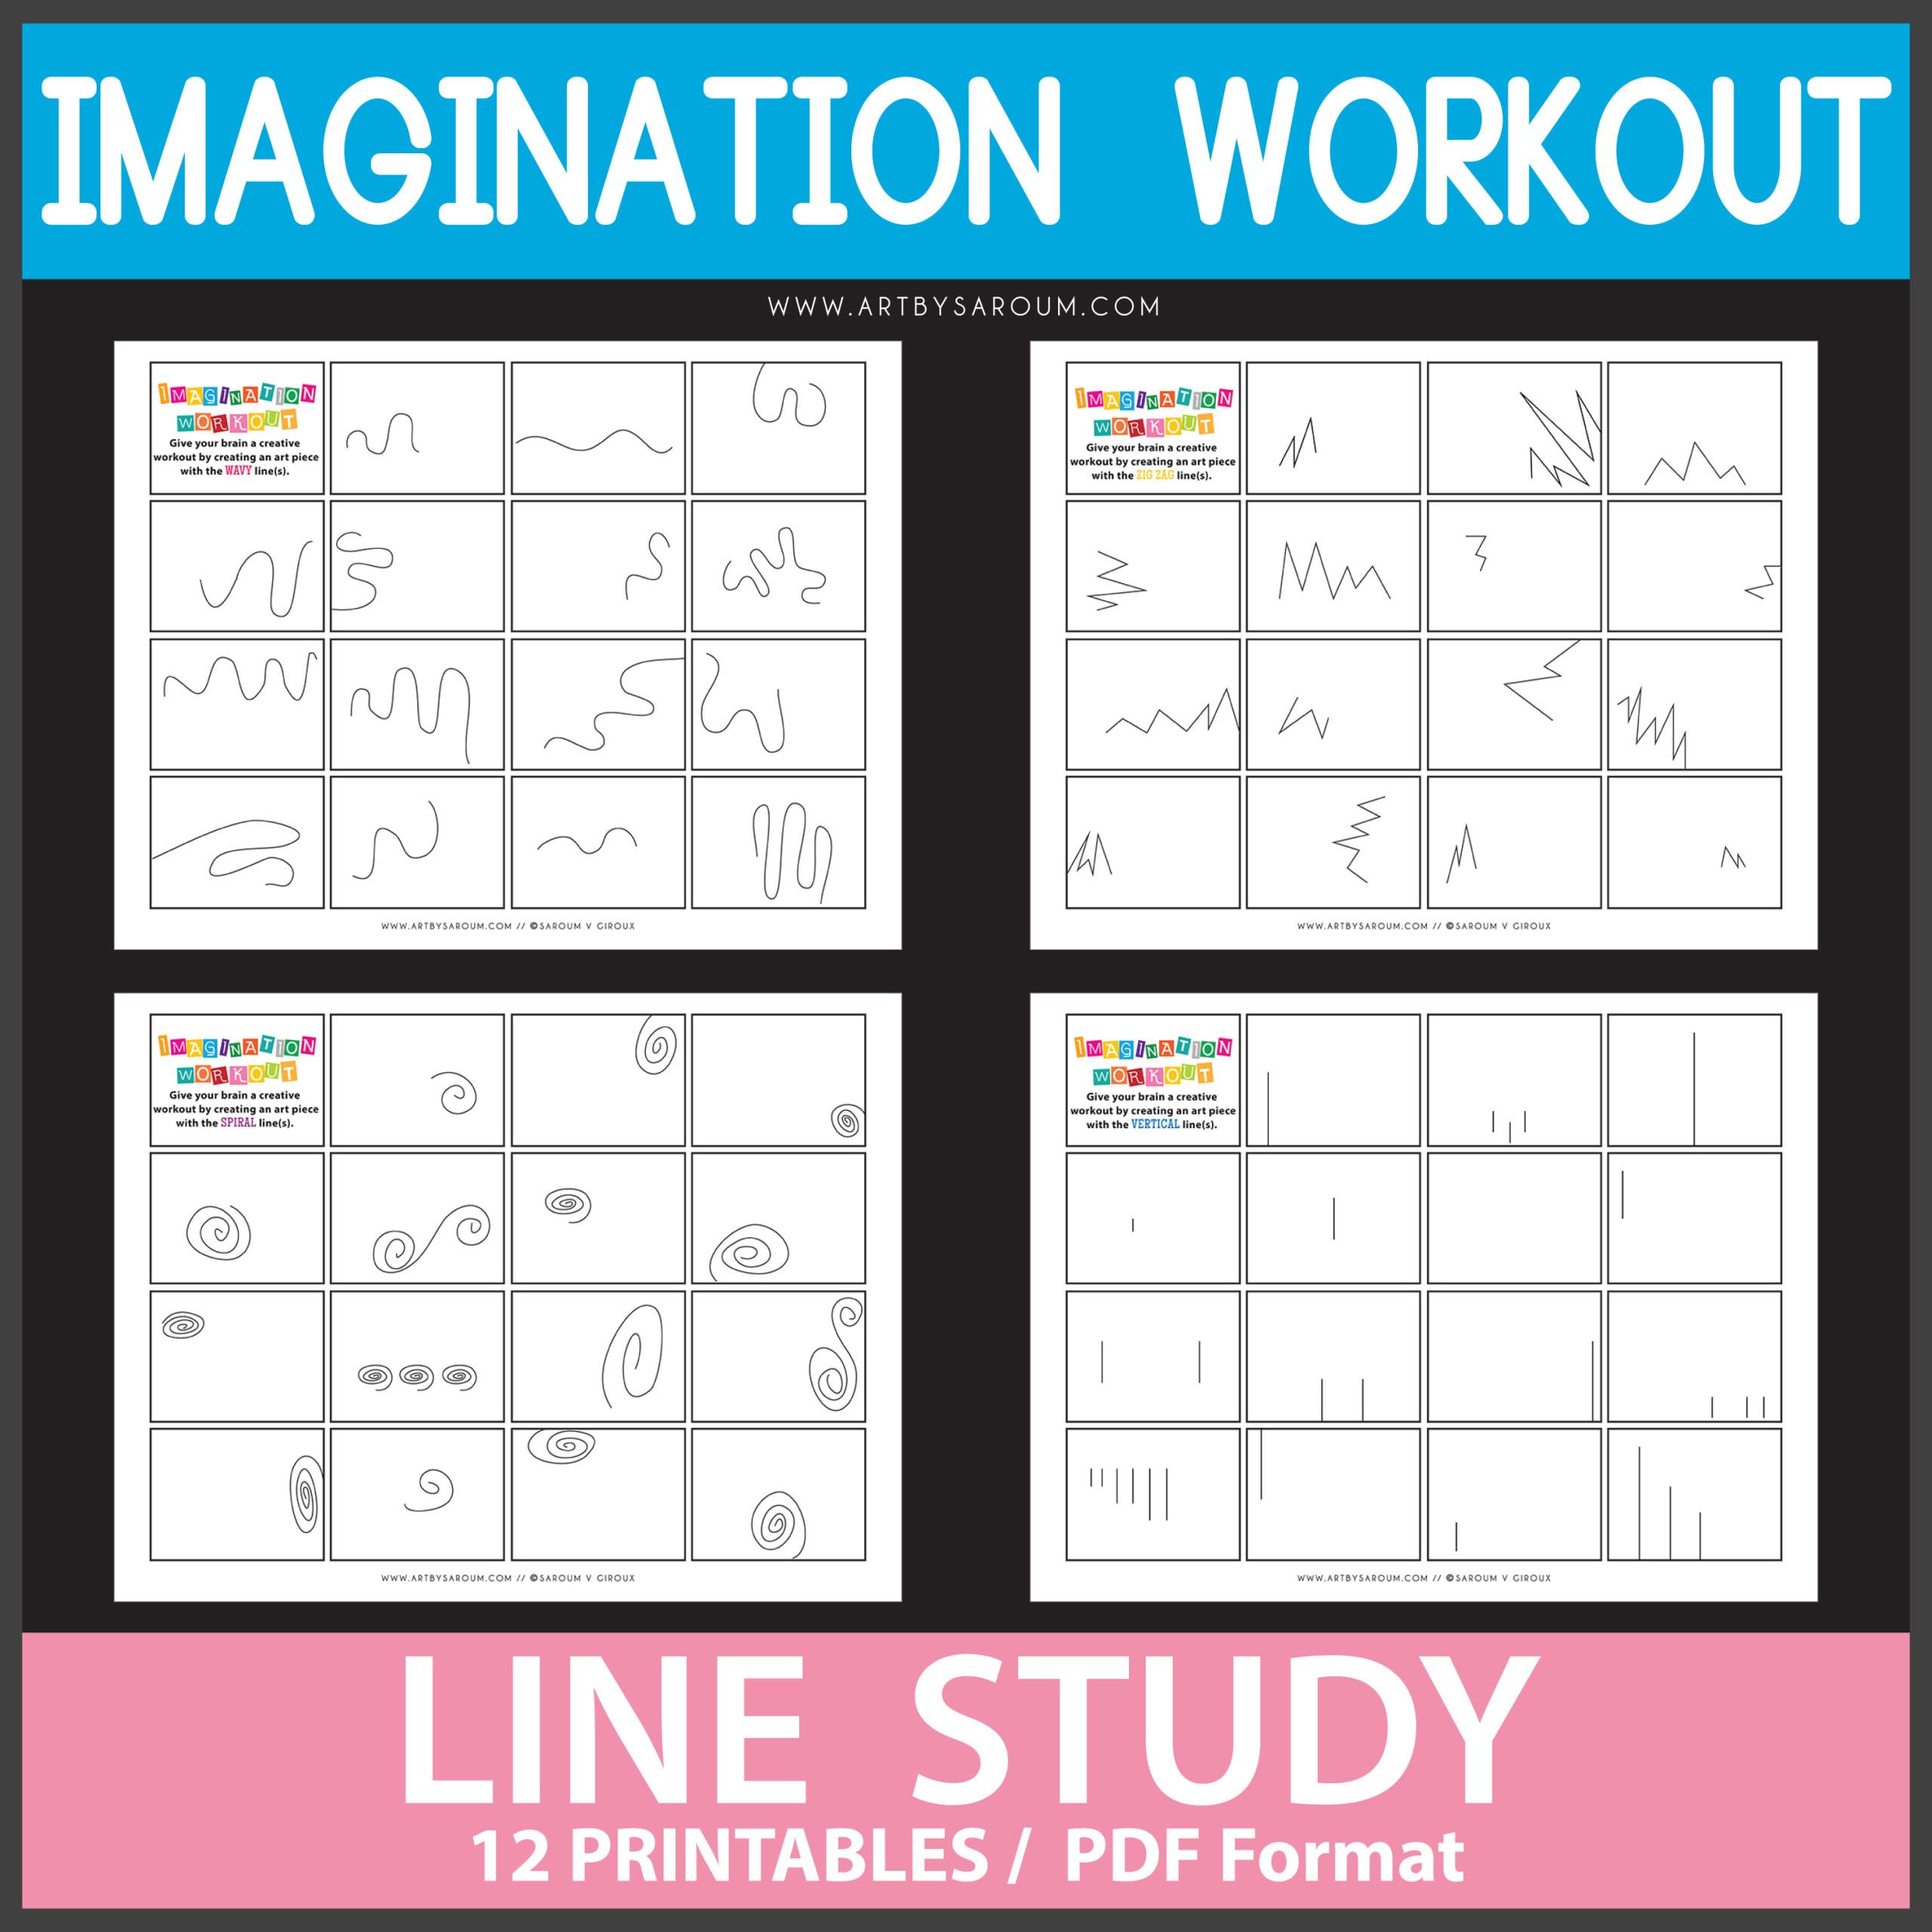 Lines Study Imagination Workout